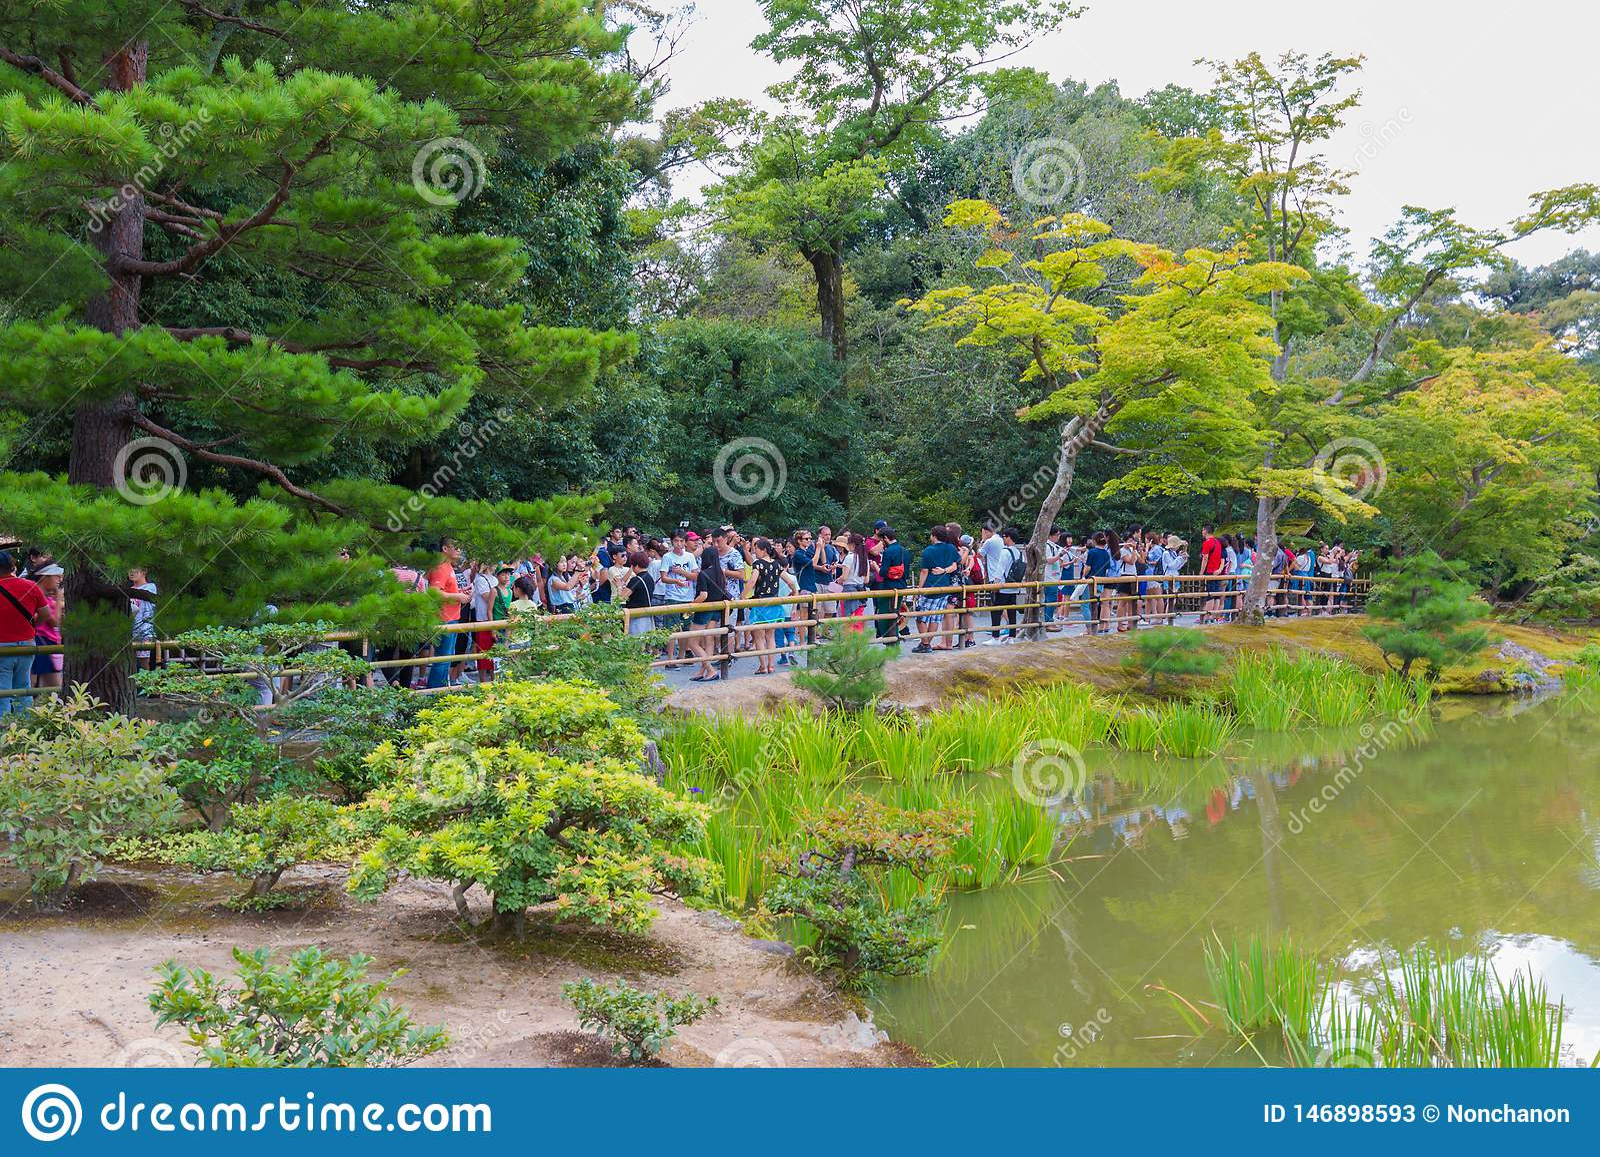 The Tourists Visit Kinkaku Ji Temple It Is A Zen Buddhist Temple